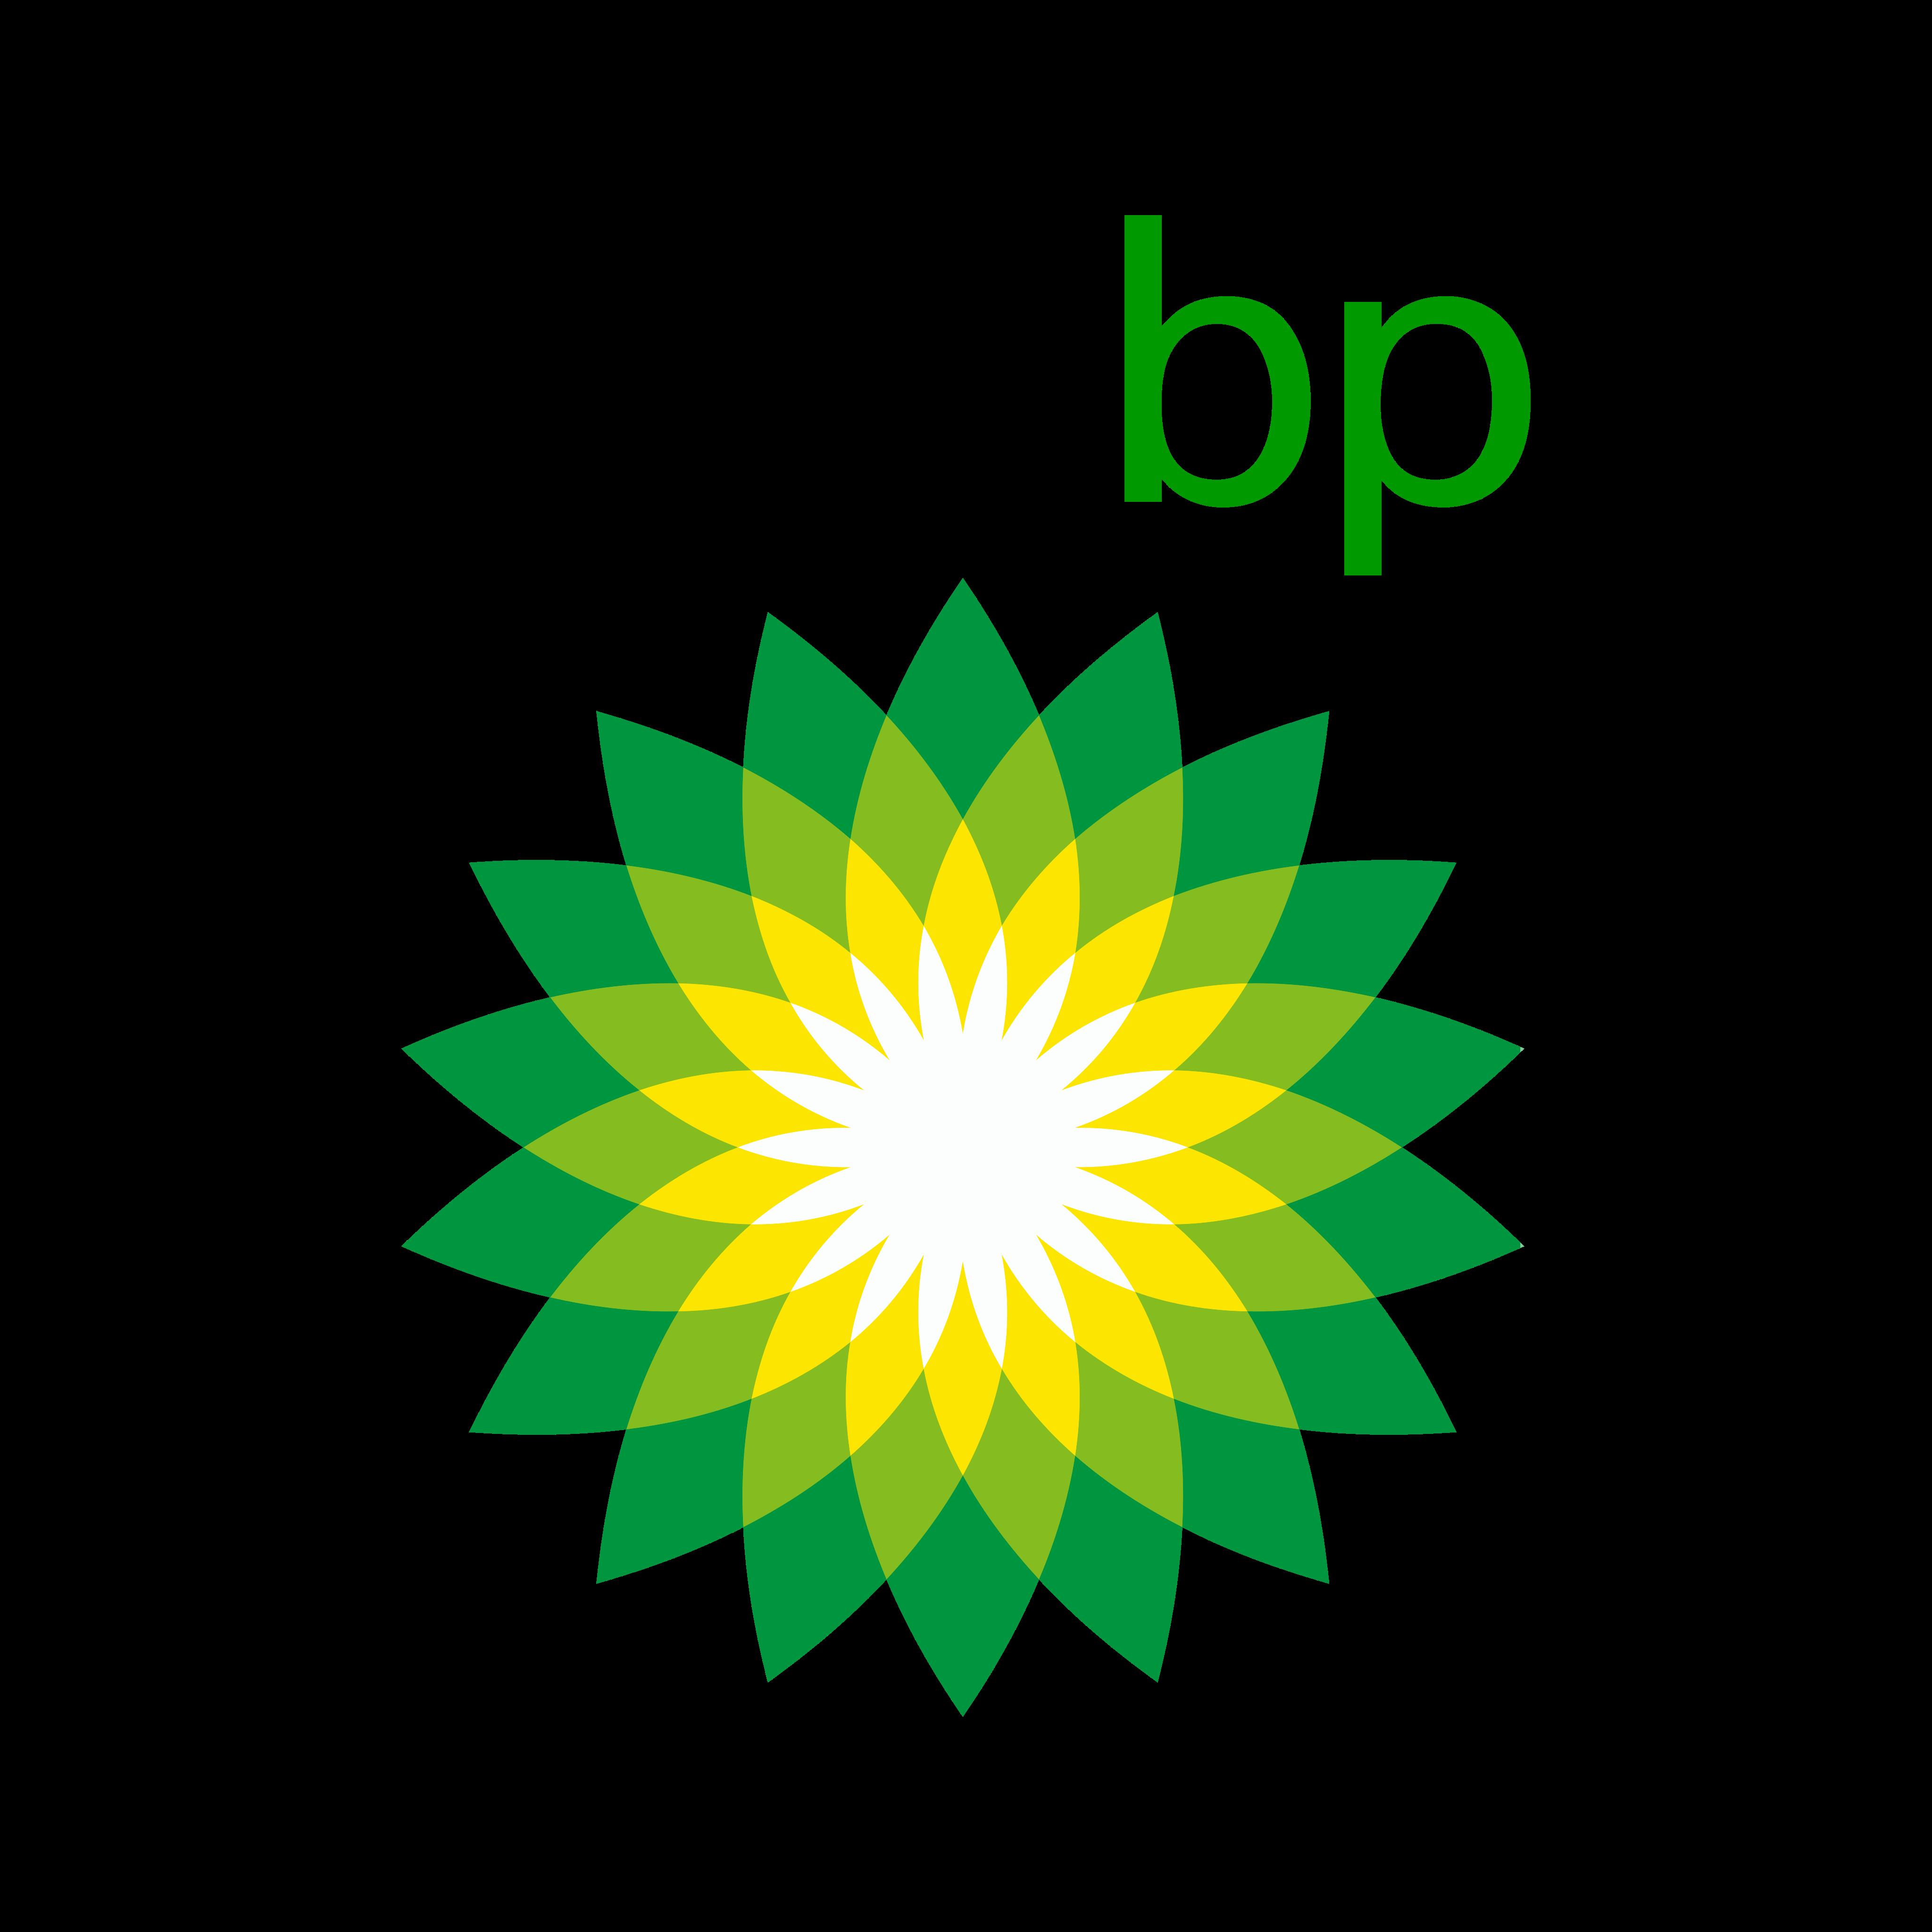 bp logo 0 - BP Logo